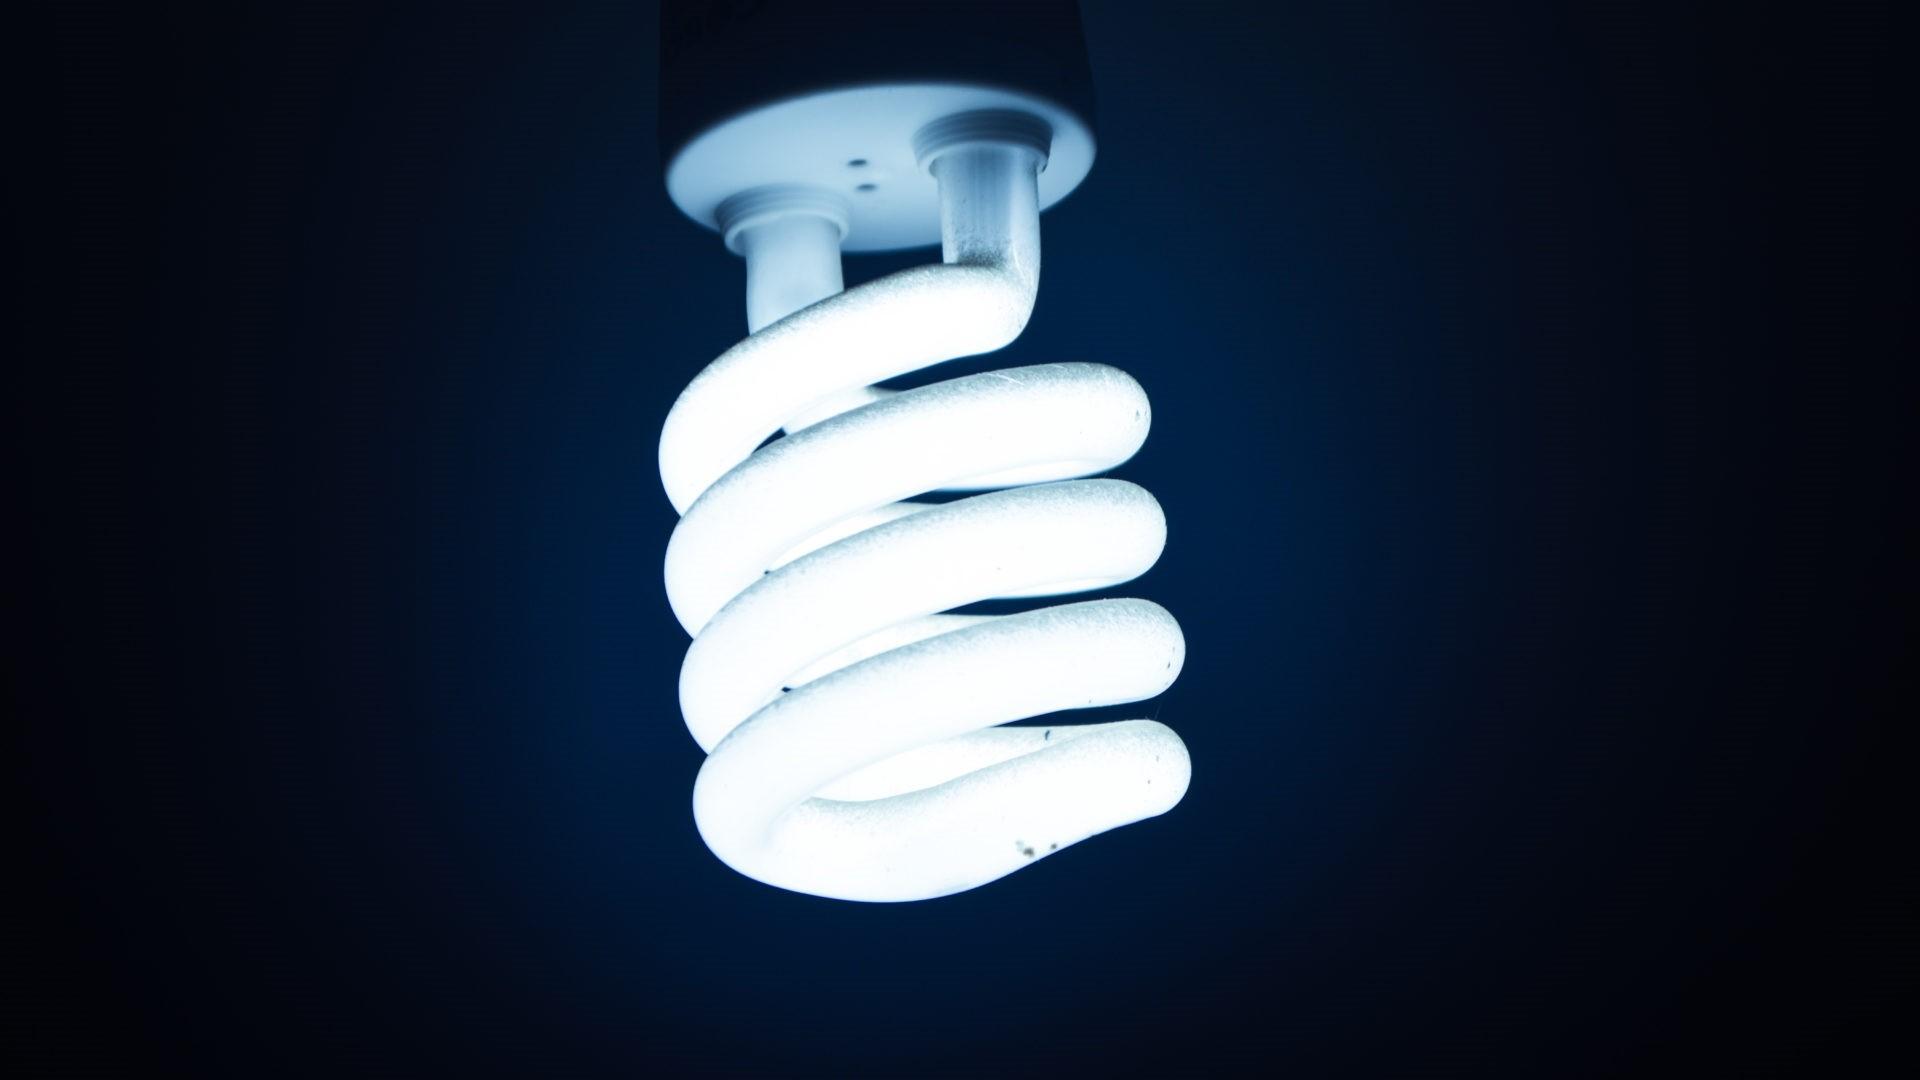 Energy Saving Full HD Wallpaper